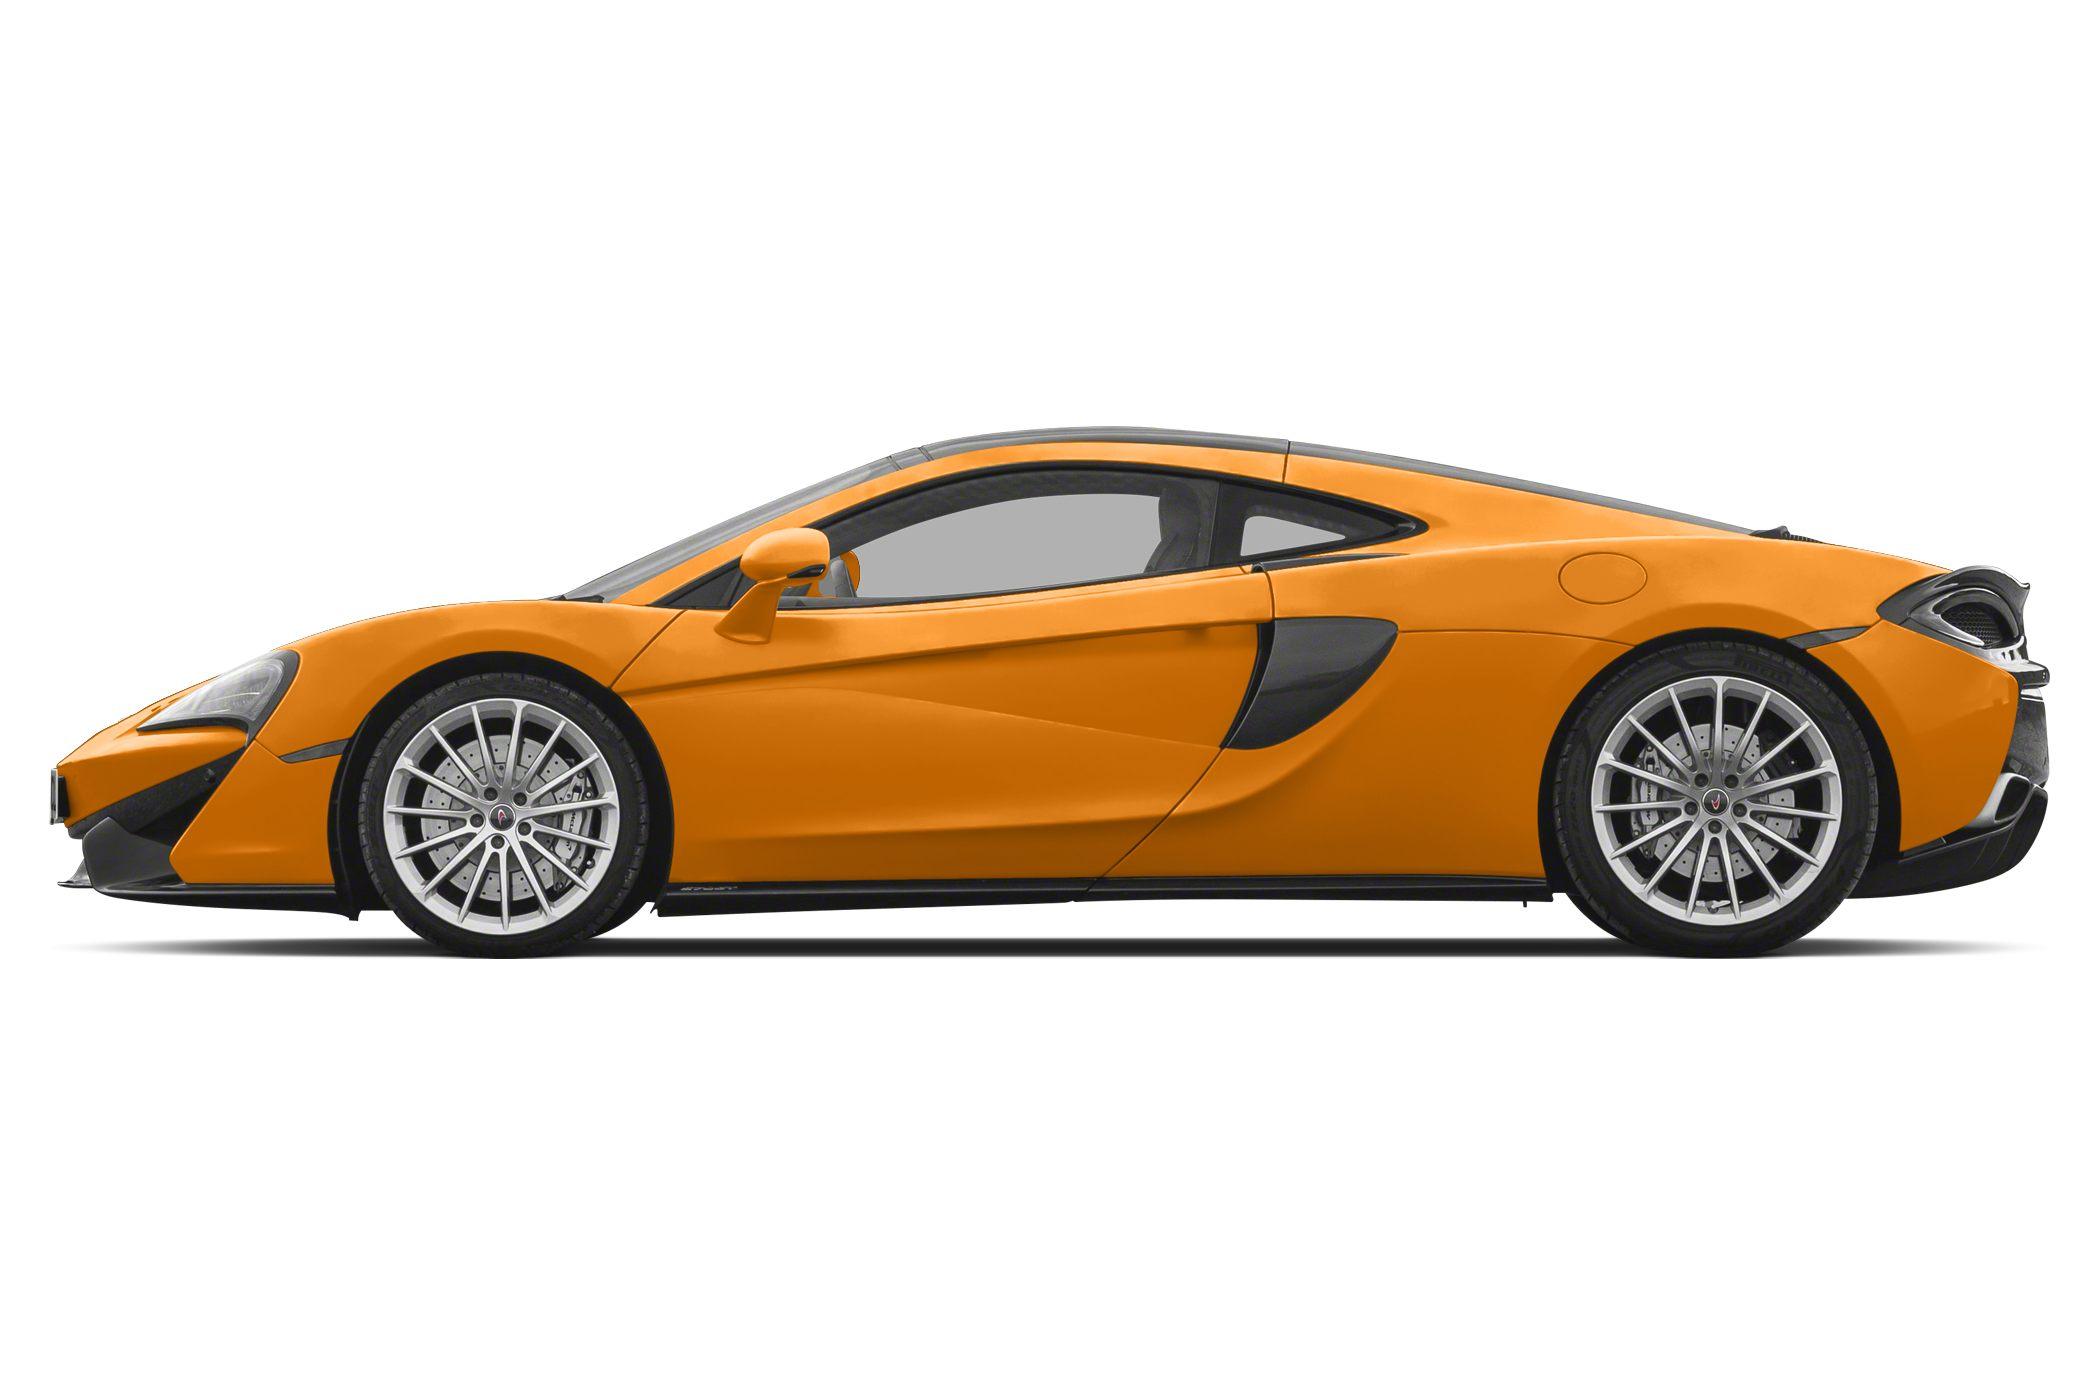 Mclaren car price 2017 uk 19